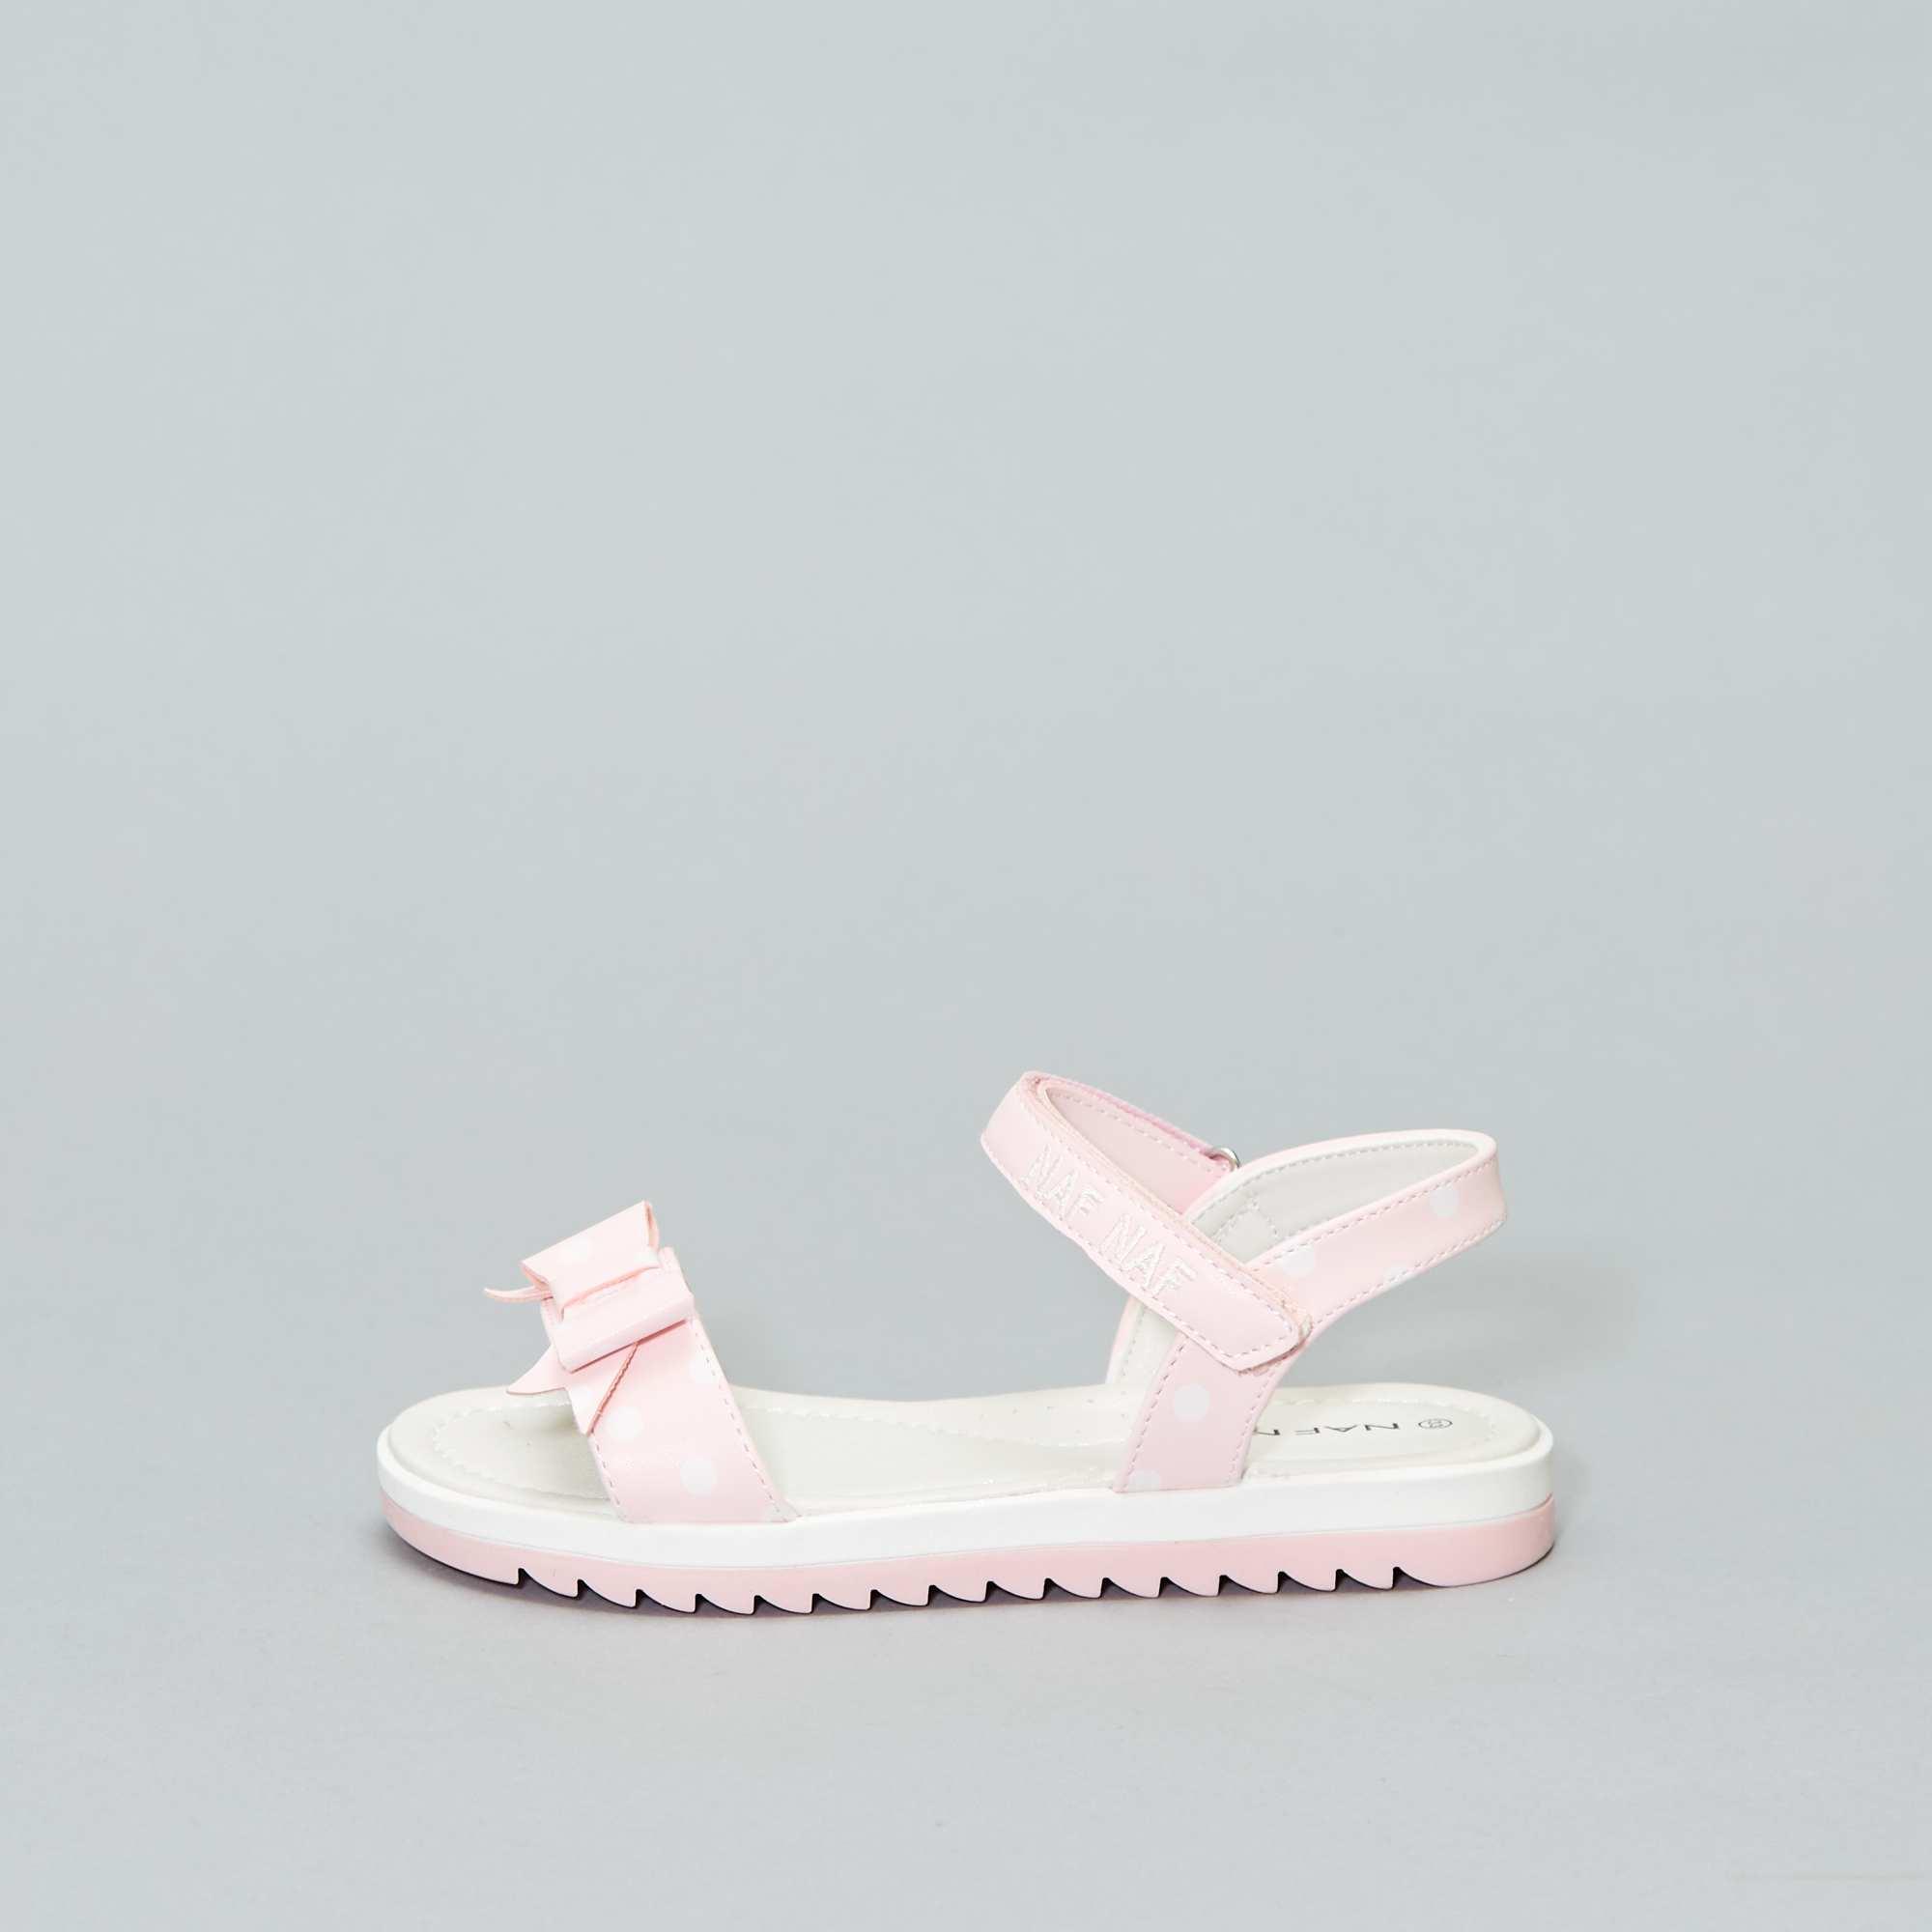 da29f82ca5e Gestippelde sandalen van 'Naf Naf' Kinderkleding meisjes - ROSE ...